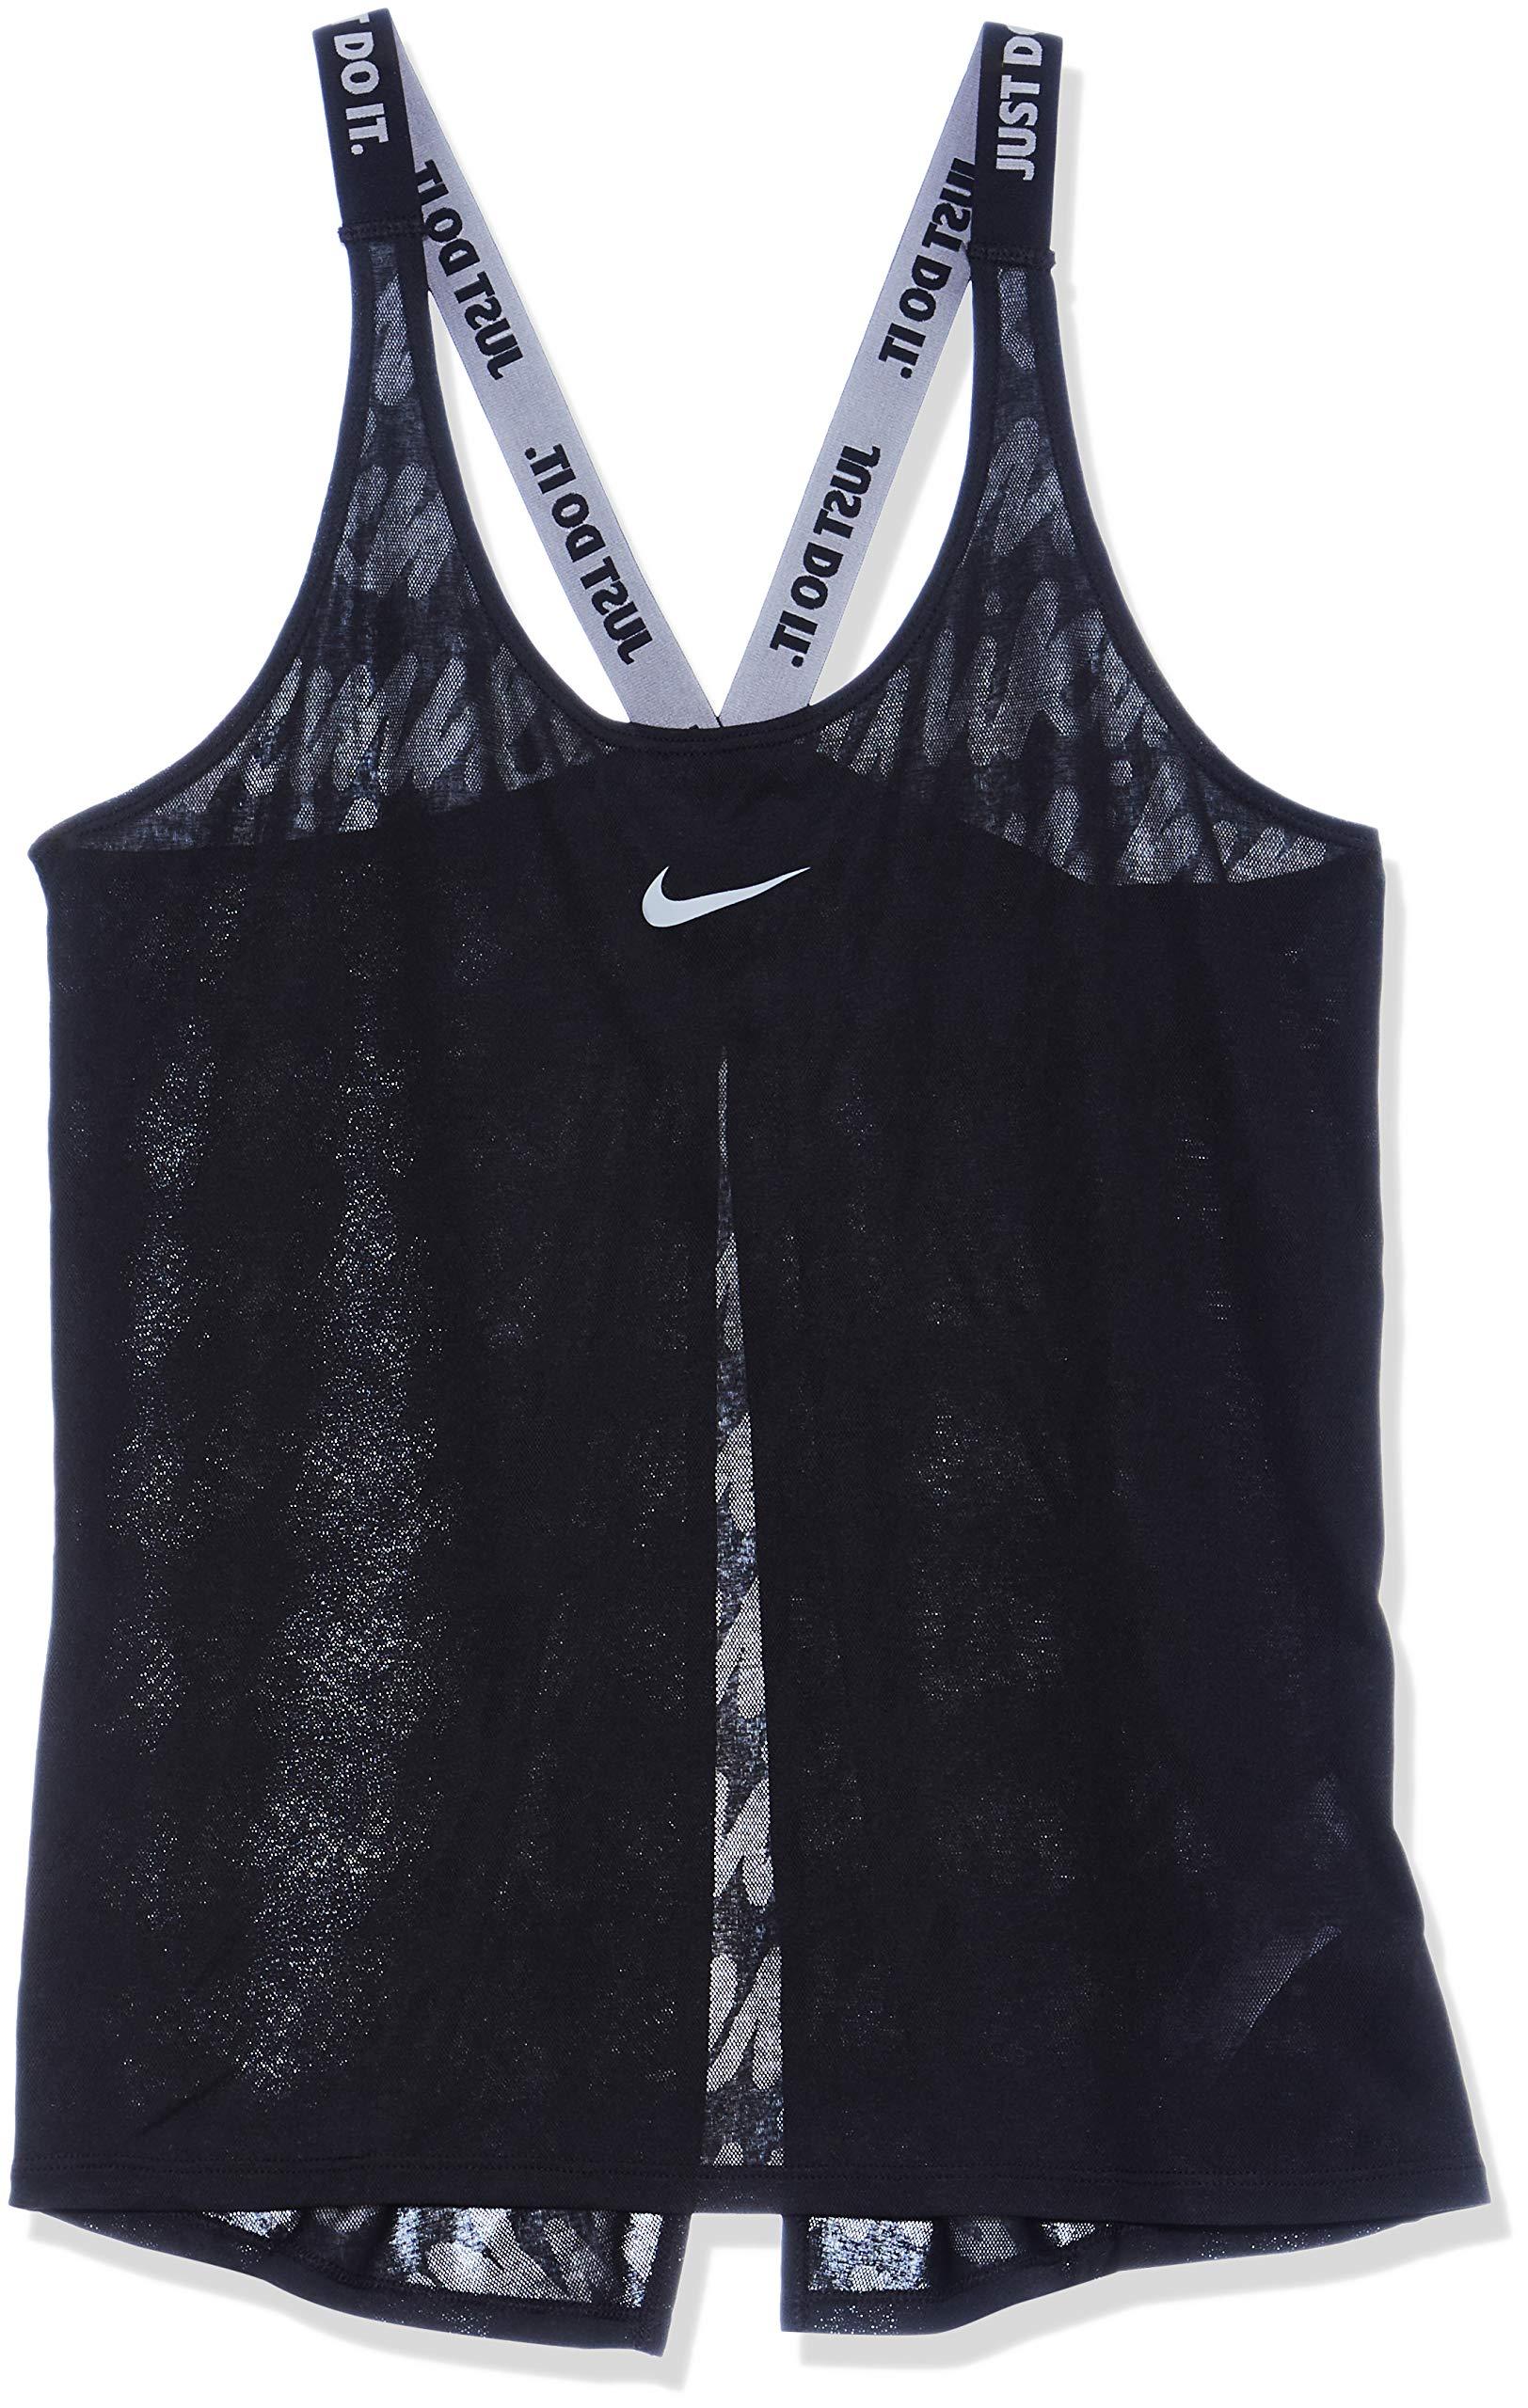 Nike Women's Dri-FIT Elastika Training Tank Top, Multicolor (Black/Black/Cool Grey), M by Nike